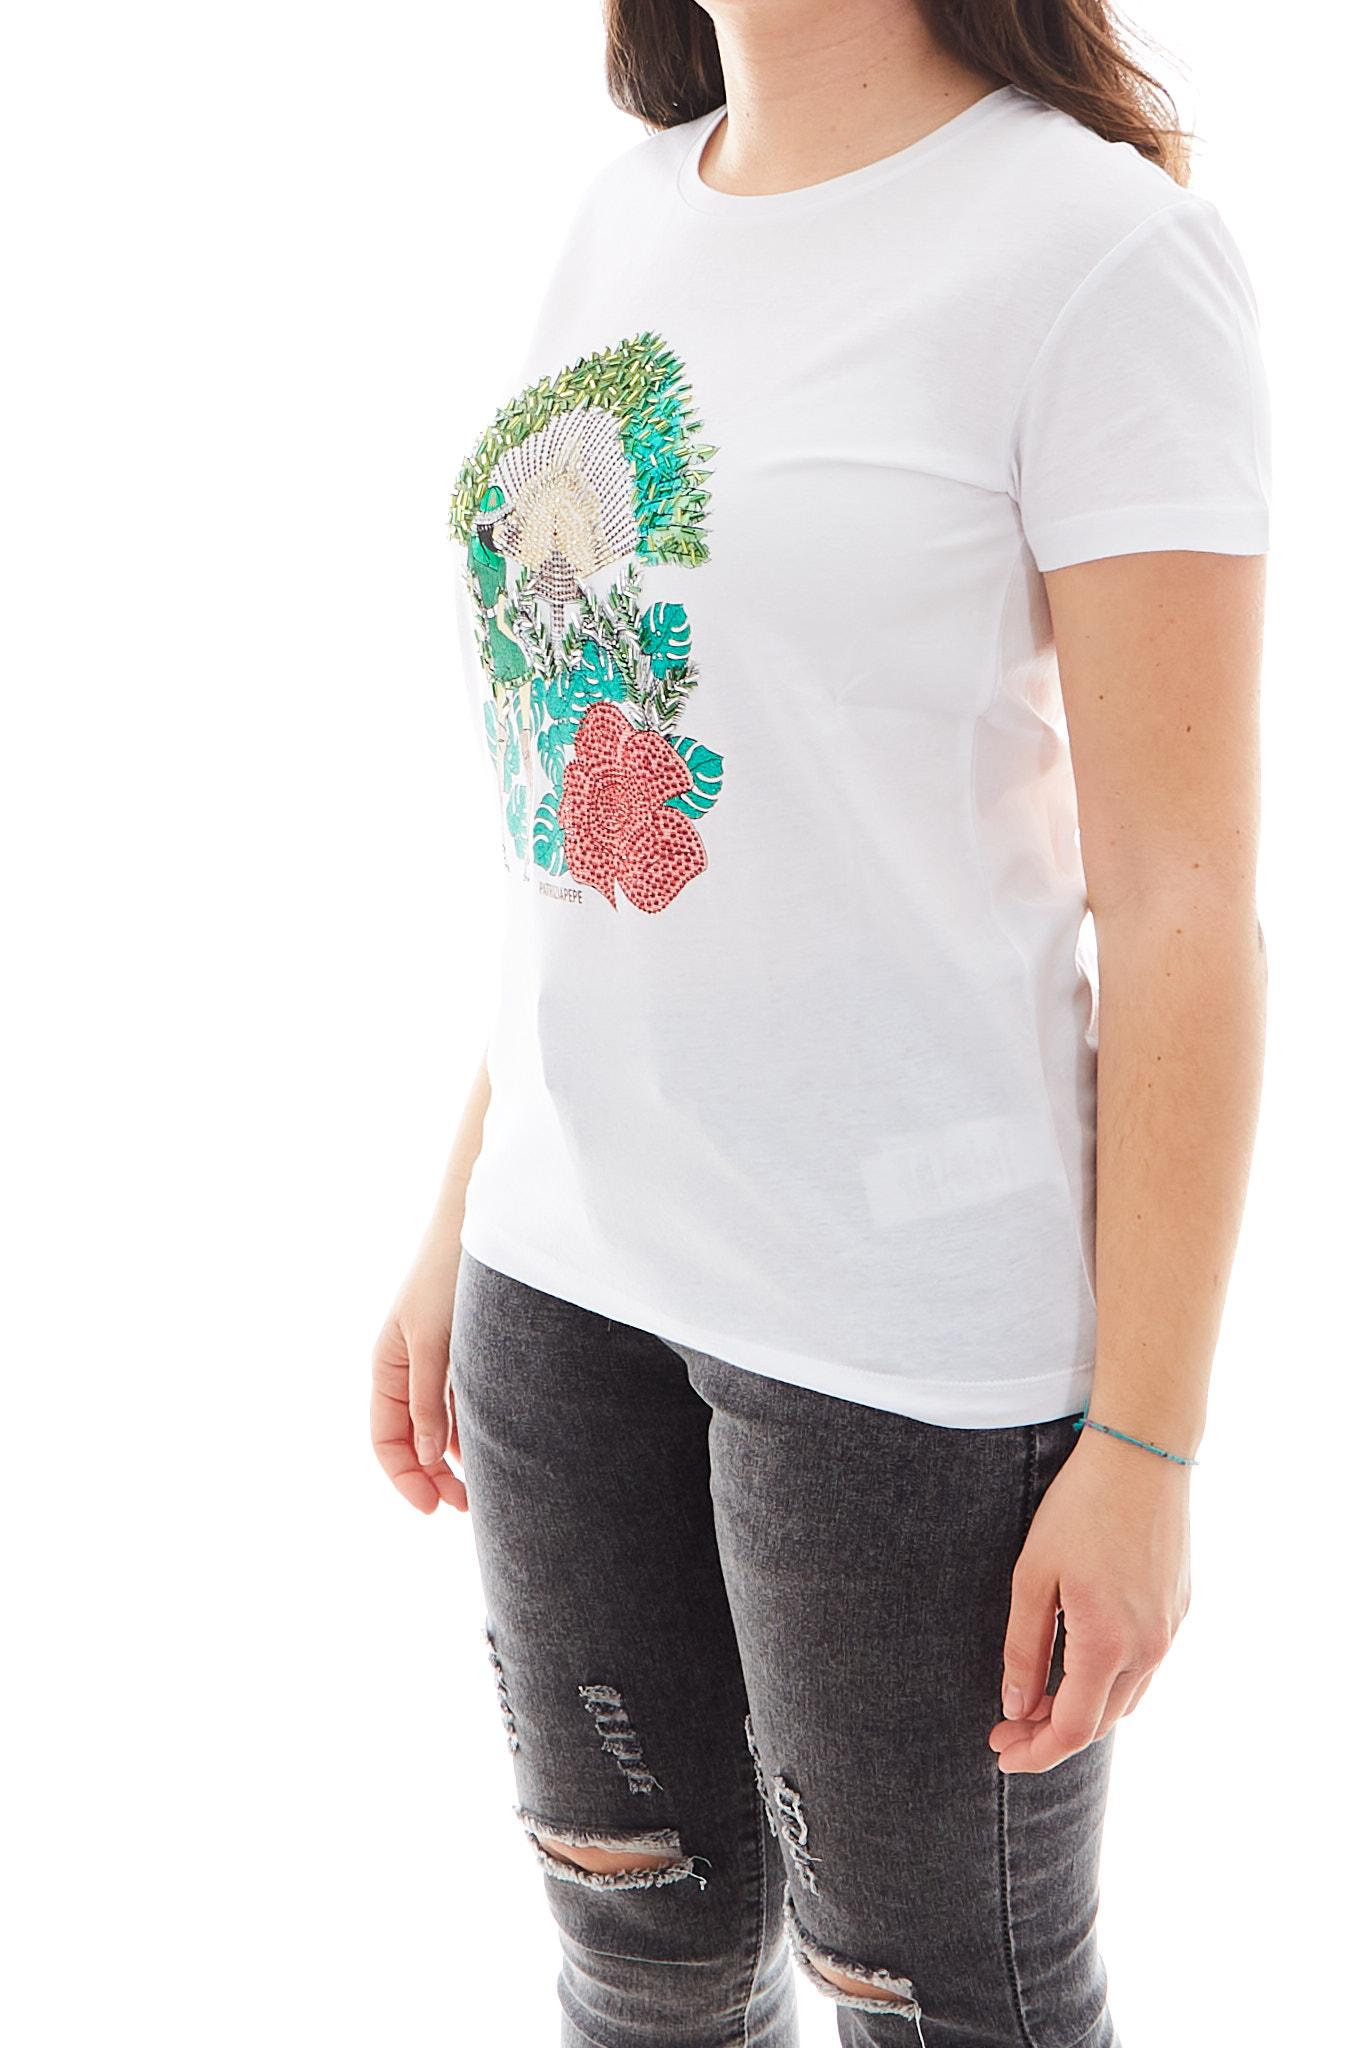 T-shirt Patrizia Pepe PATRIZIA PEPE | T-shirt | 8M1209-A8U9XU65